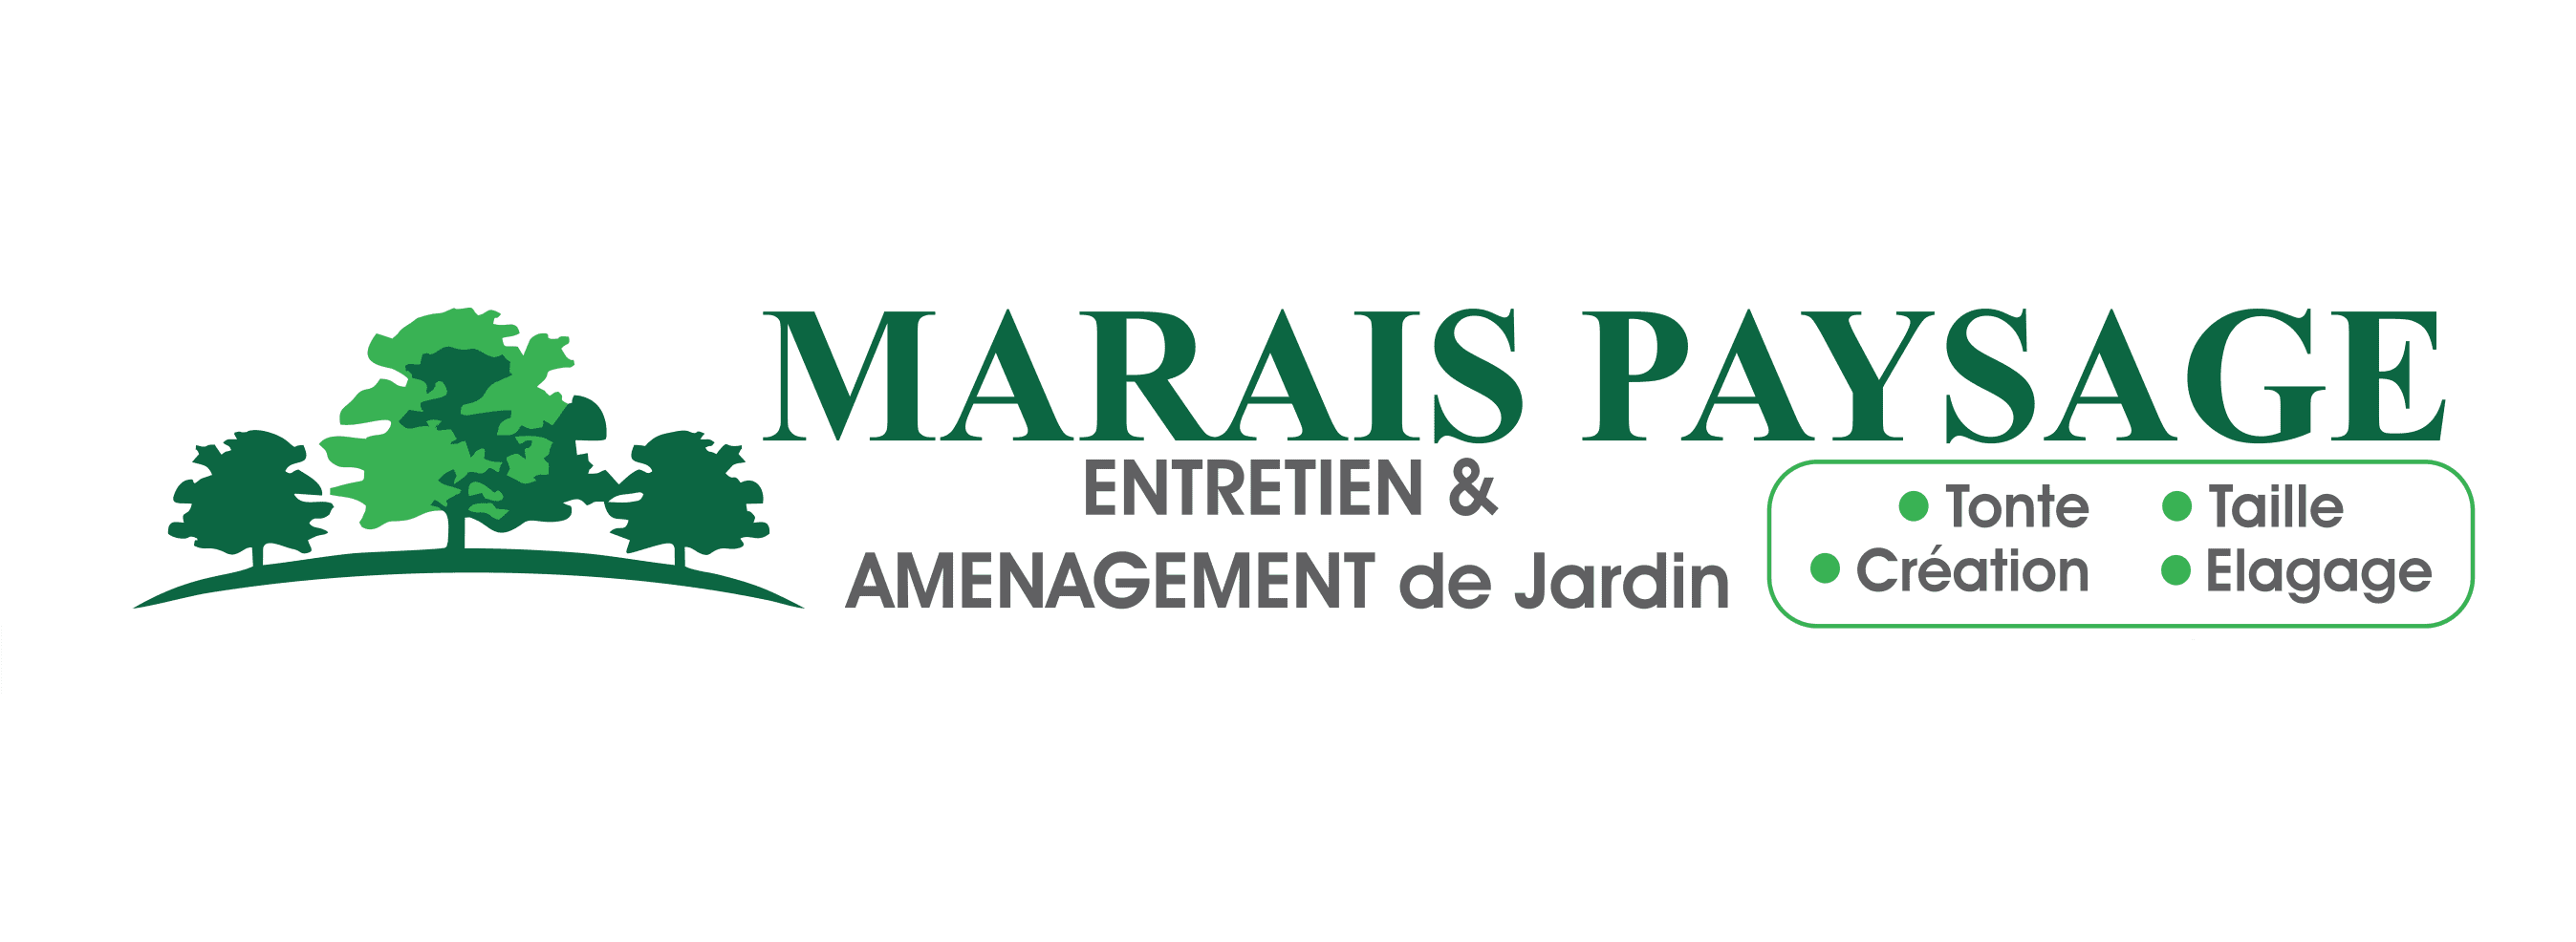 marais.png